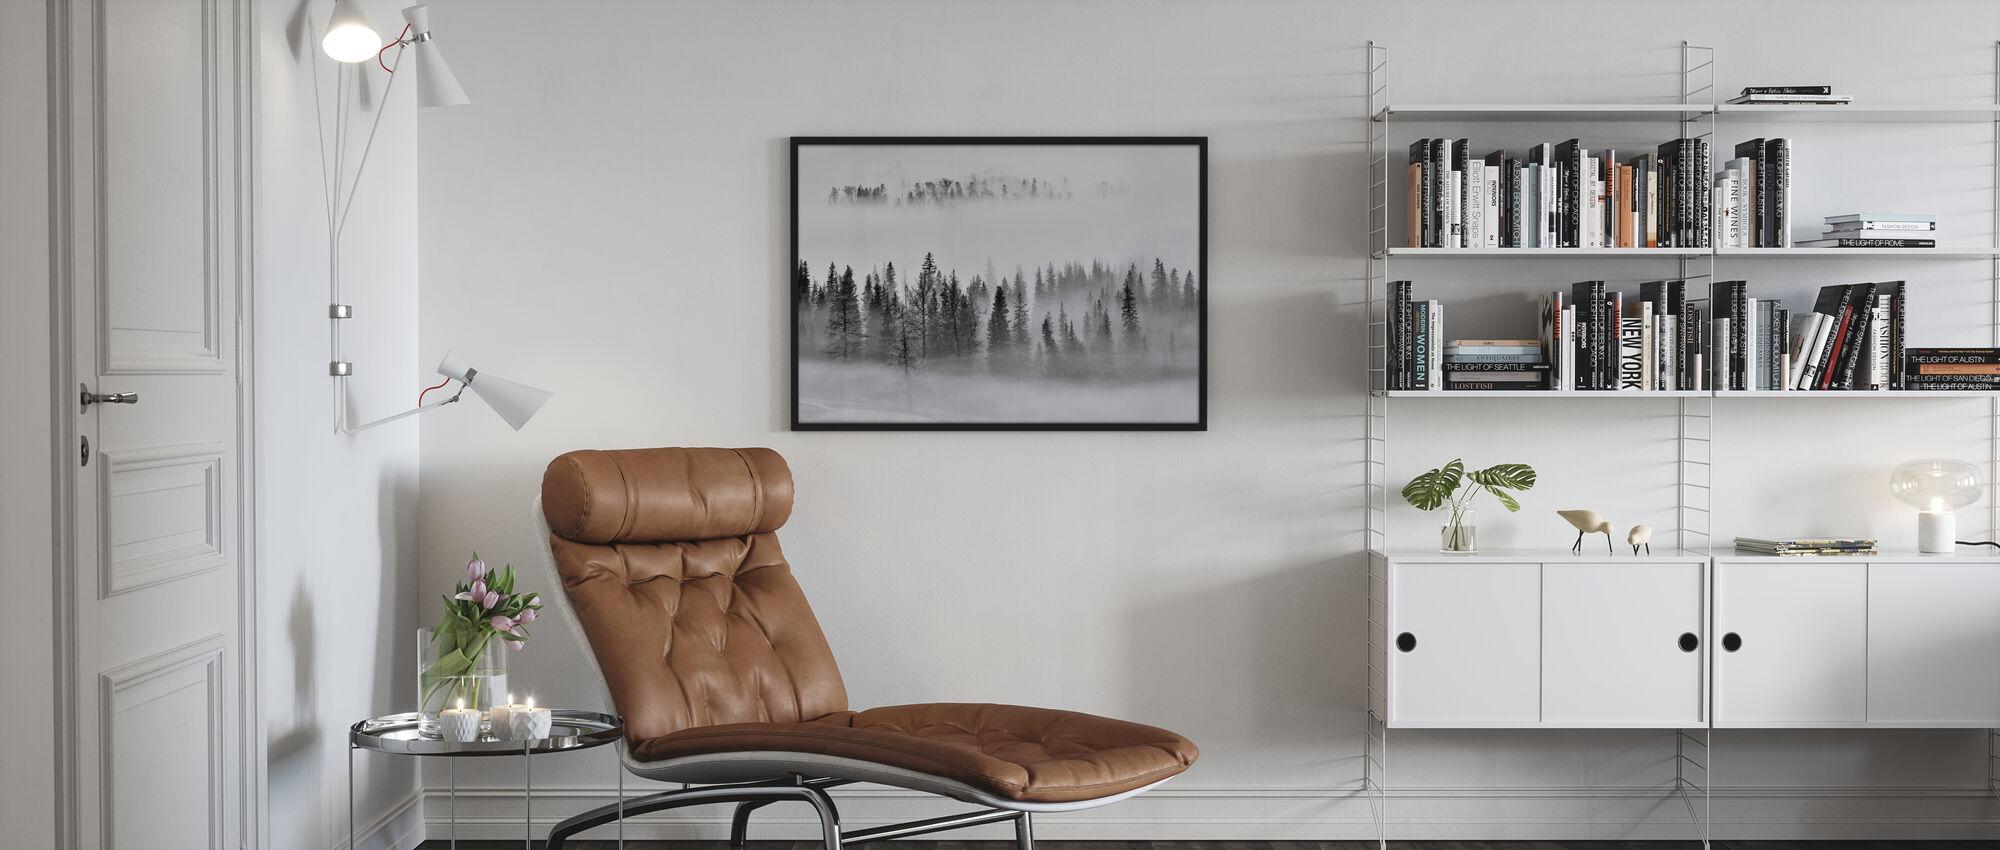 Foggy Forest - Framed print - Living Room